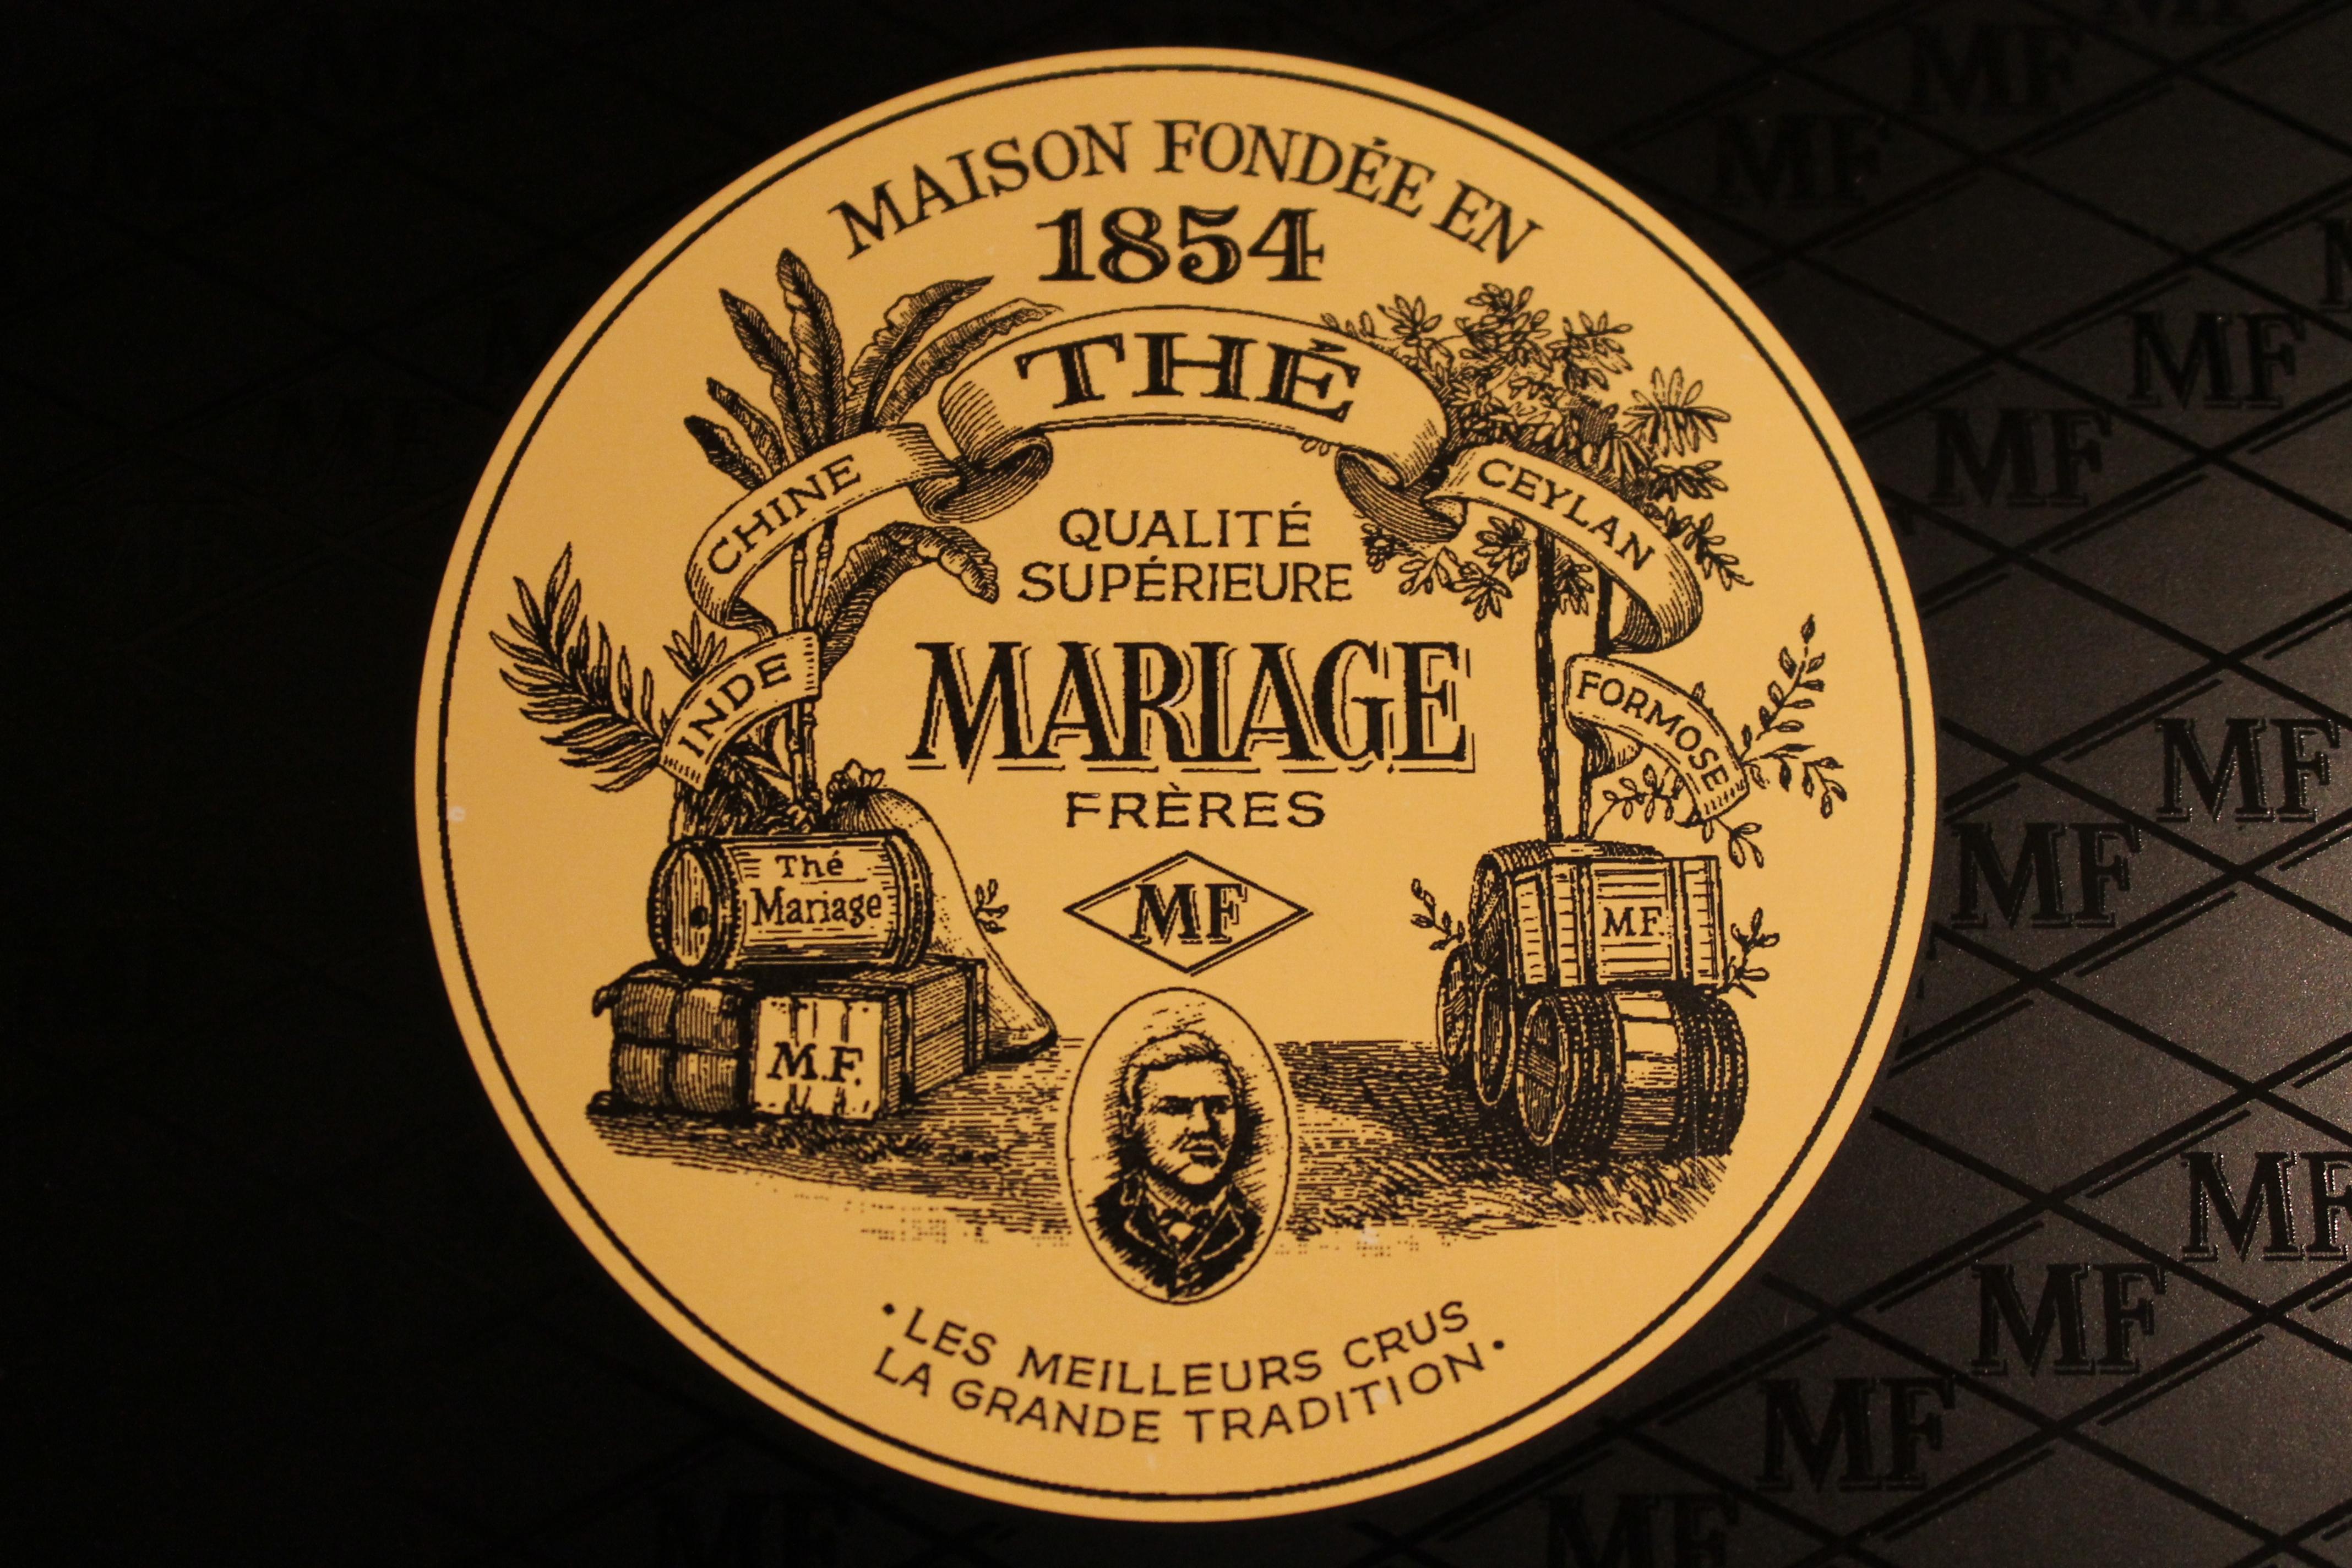 mariage freres marco polo - Mariages Freres